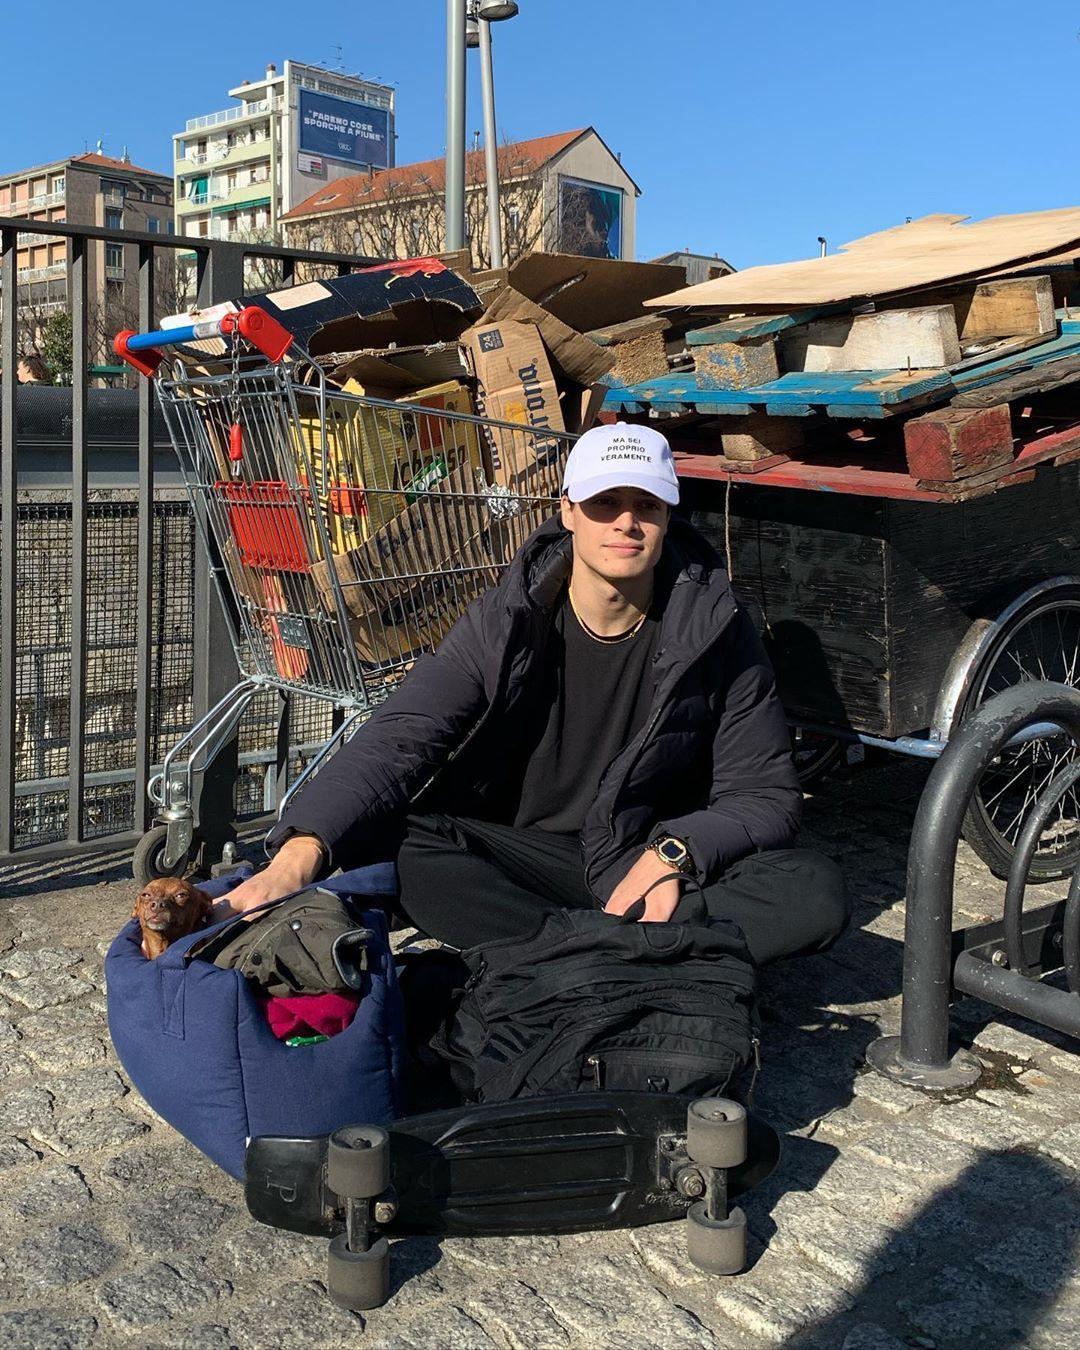 Luis Sal On Instagram Mi Sono Rotto La Palle Lascio Tutto Baby Strollers Instagram Stroller